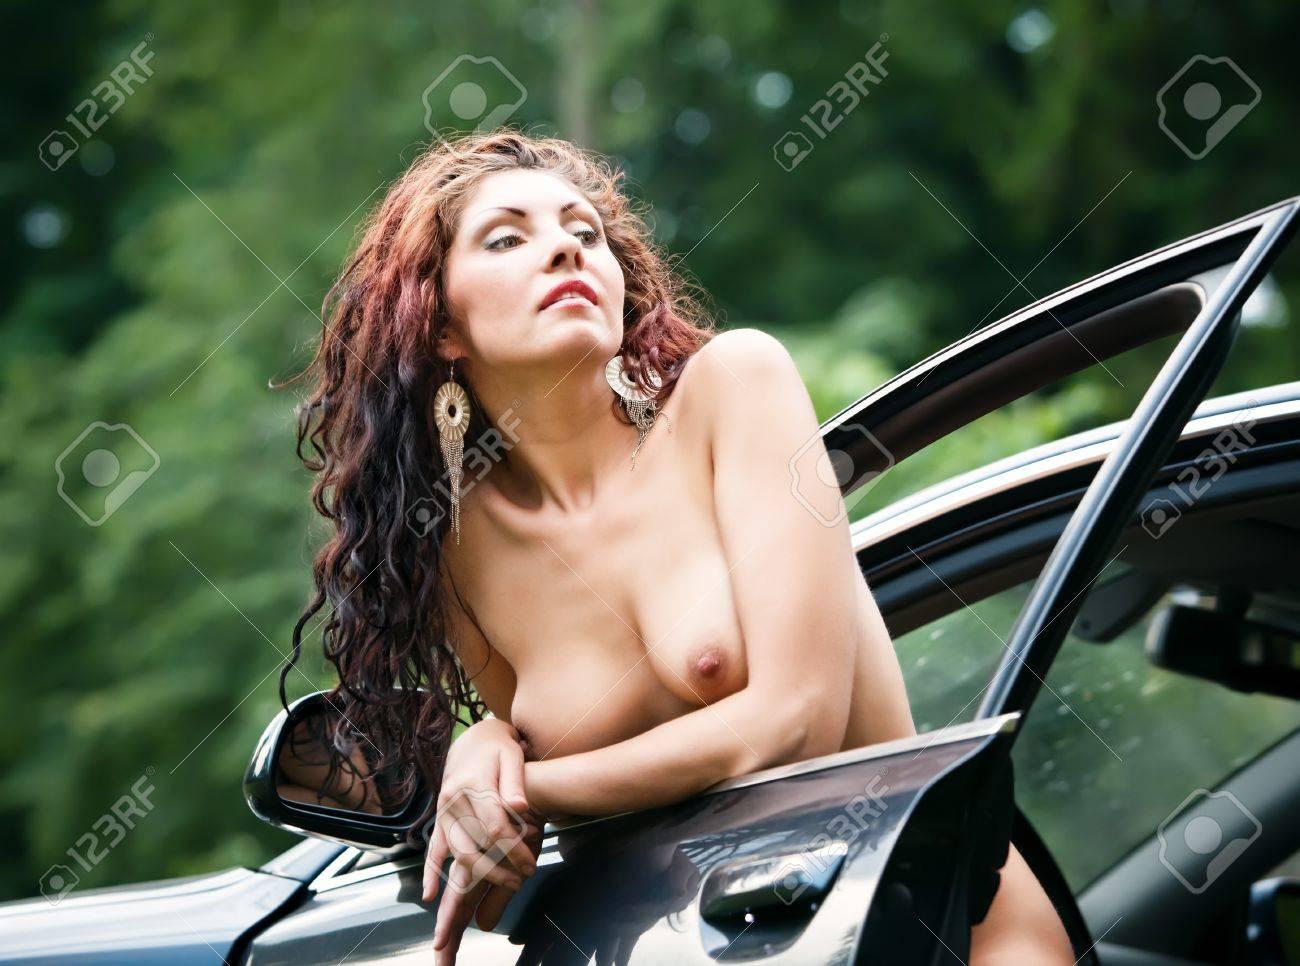 Girl on girl anal dildo